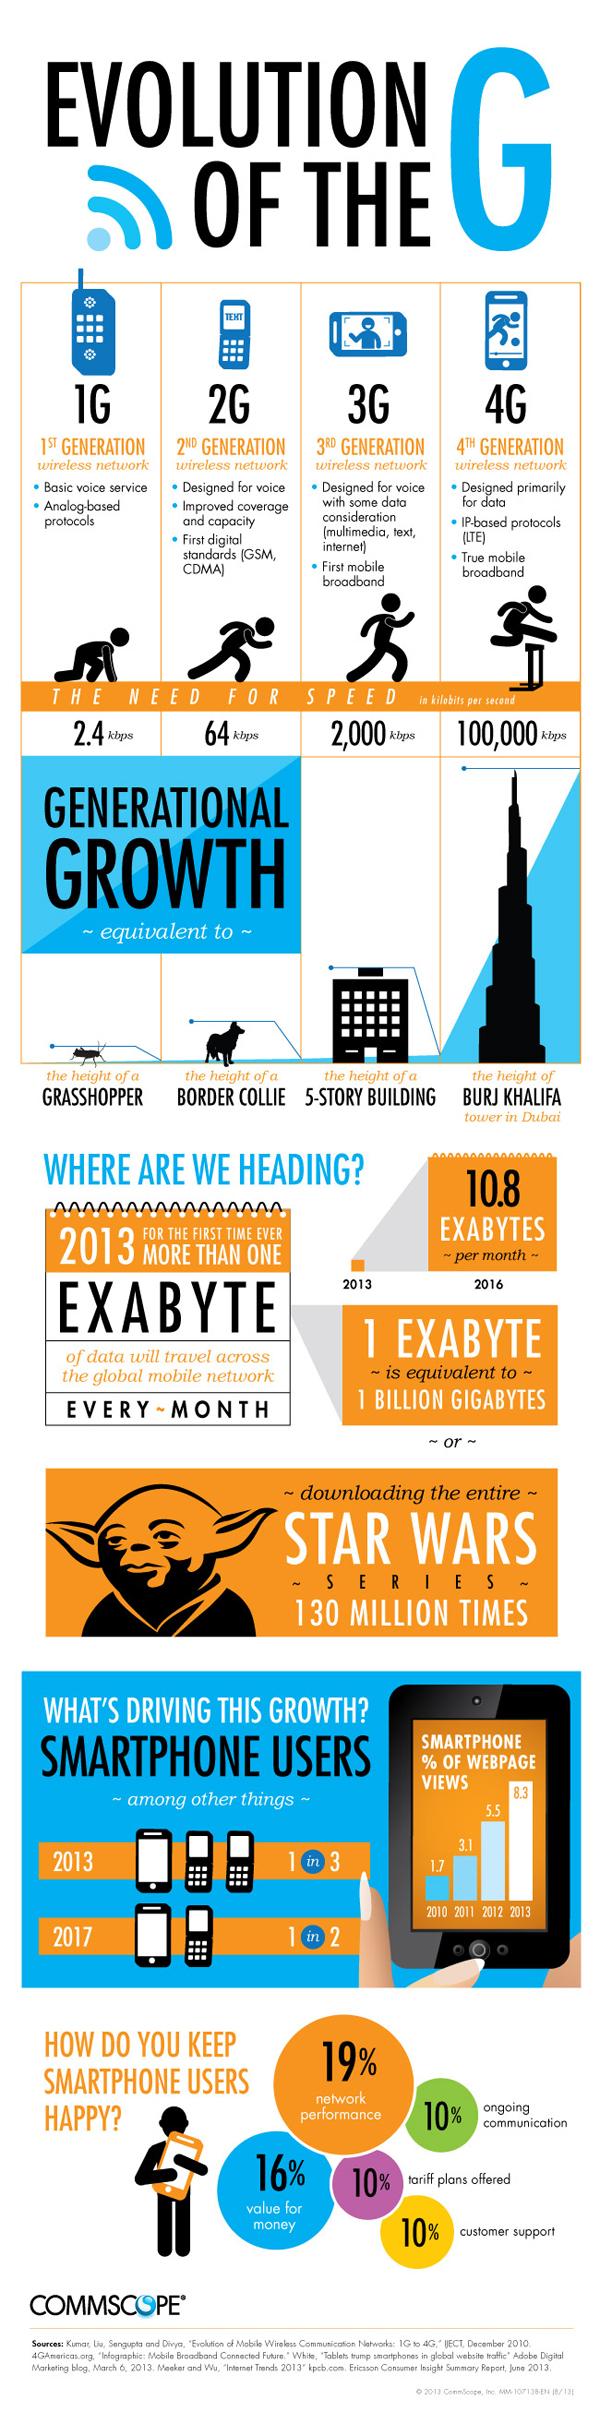 evolution-of-g-infographic